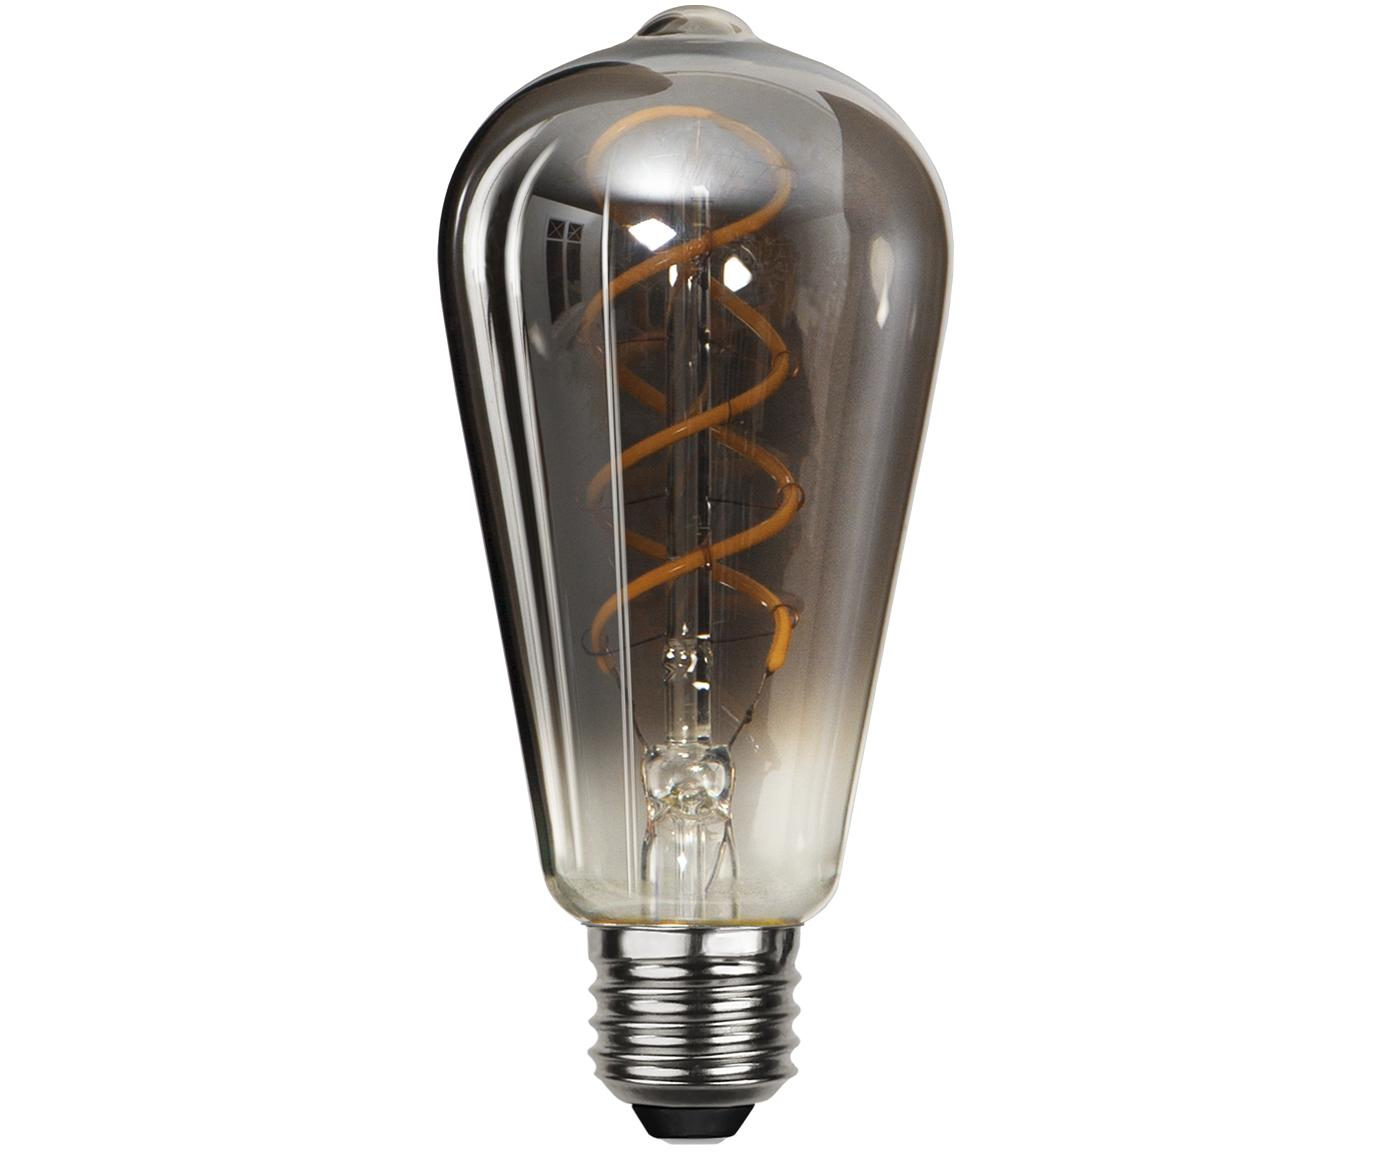 Lampadina a LED Blacked (E27 / 4Watt), Paralume: vetro, Base lampadina: nichel, Nero, Ø 6 x Alt. 14 cm